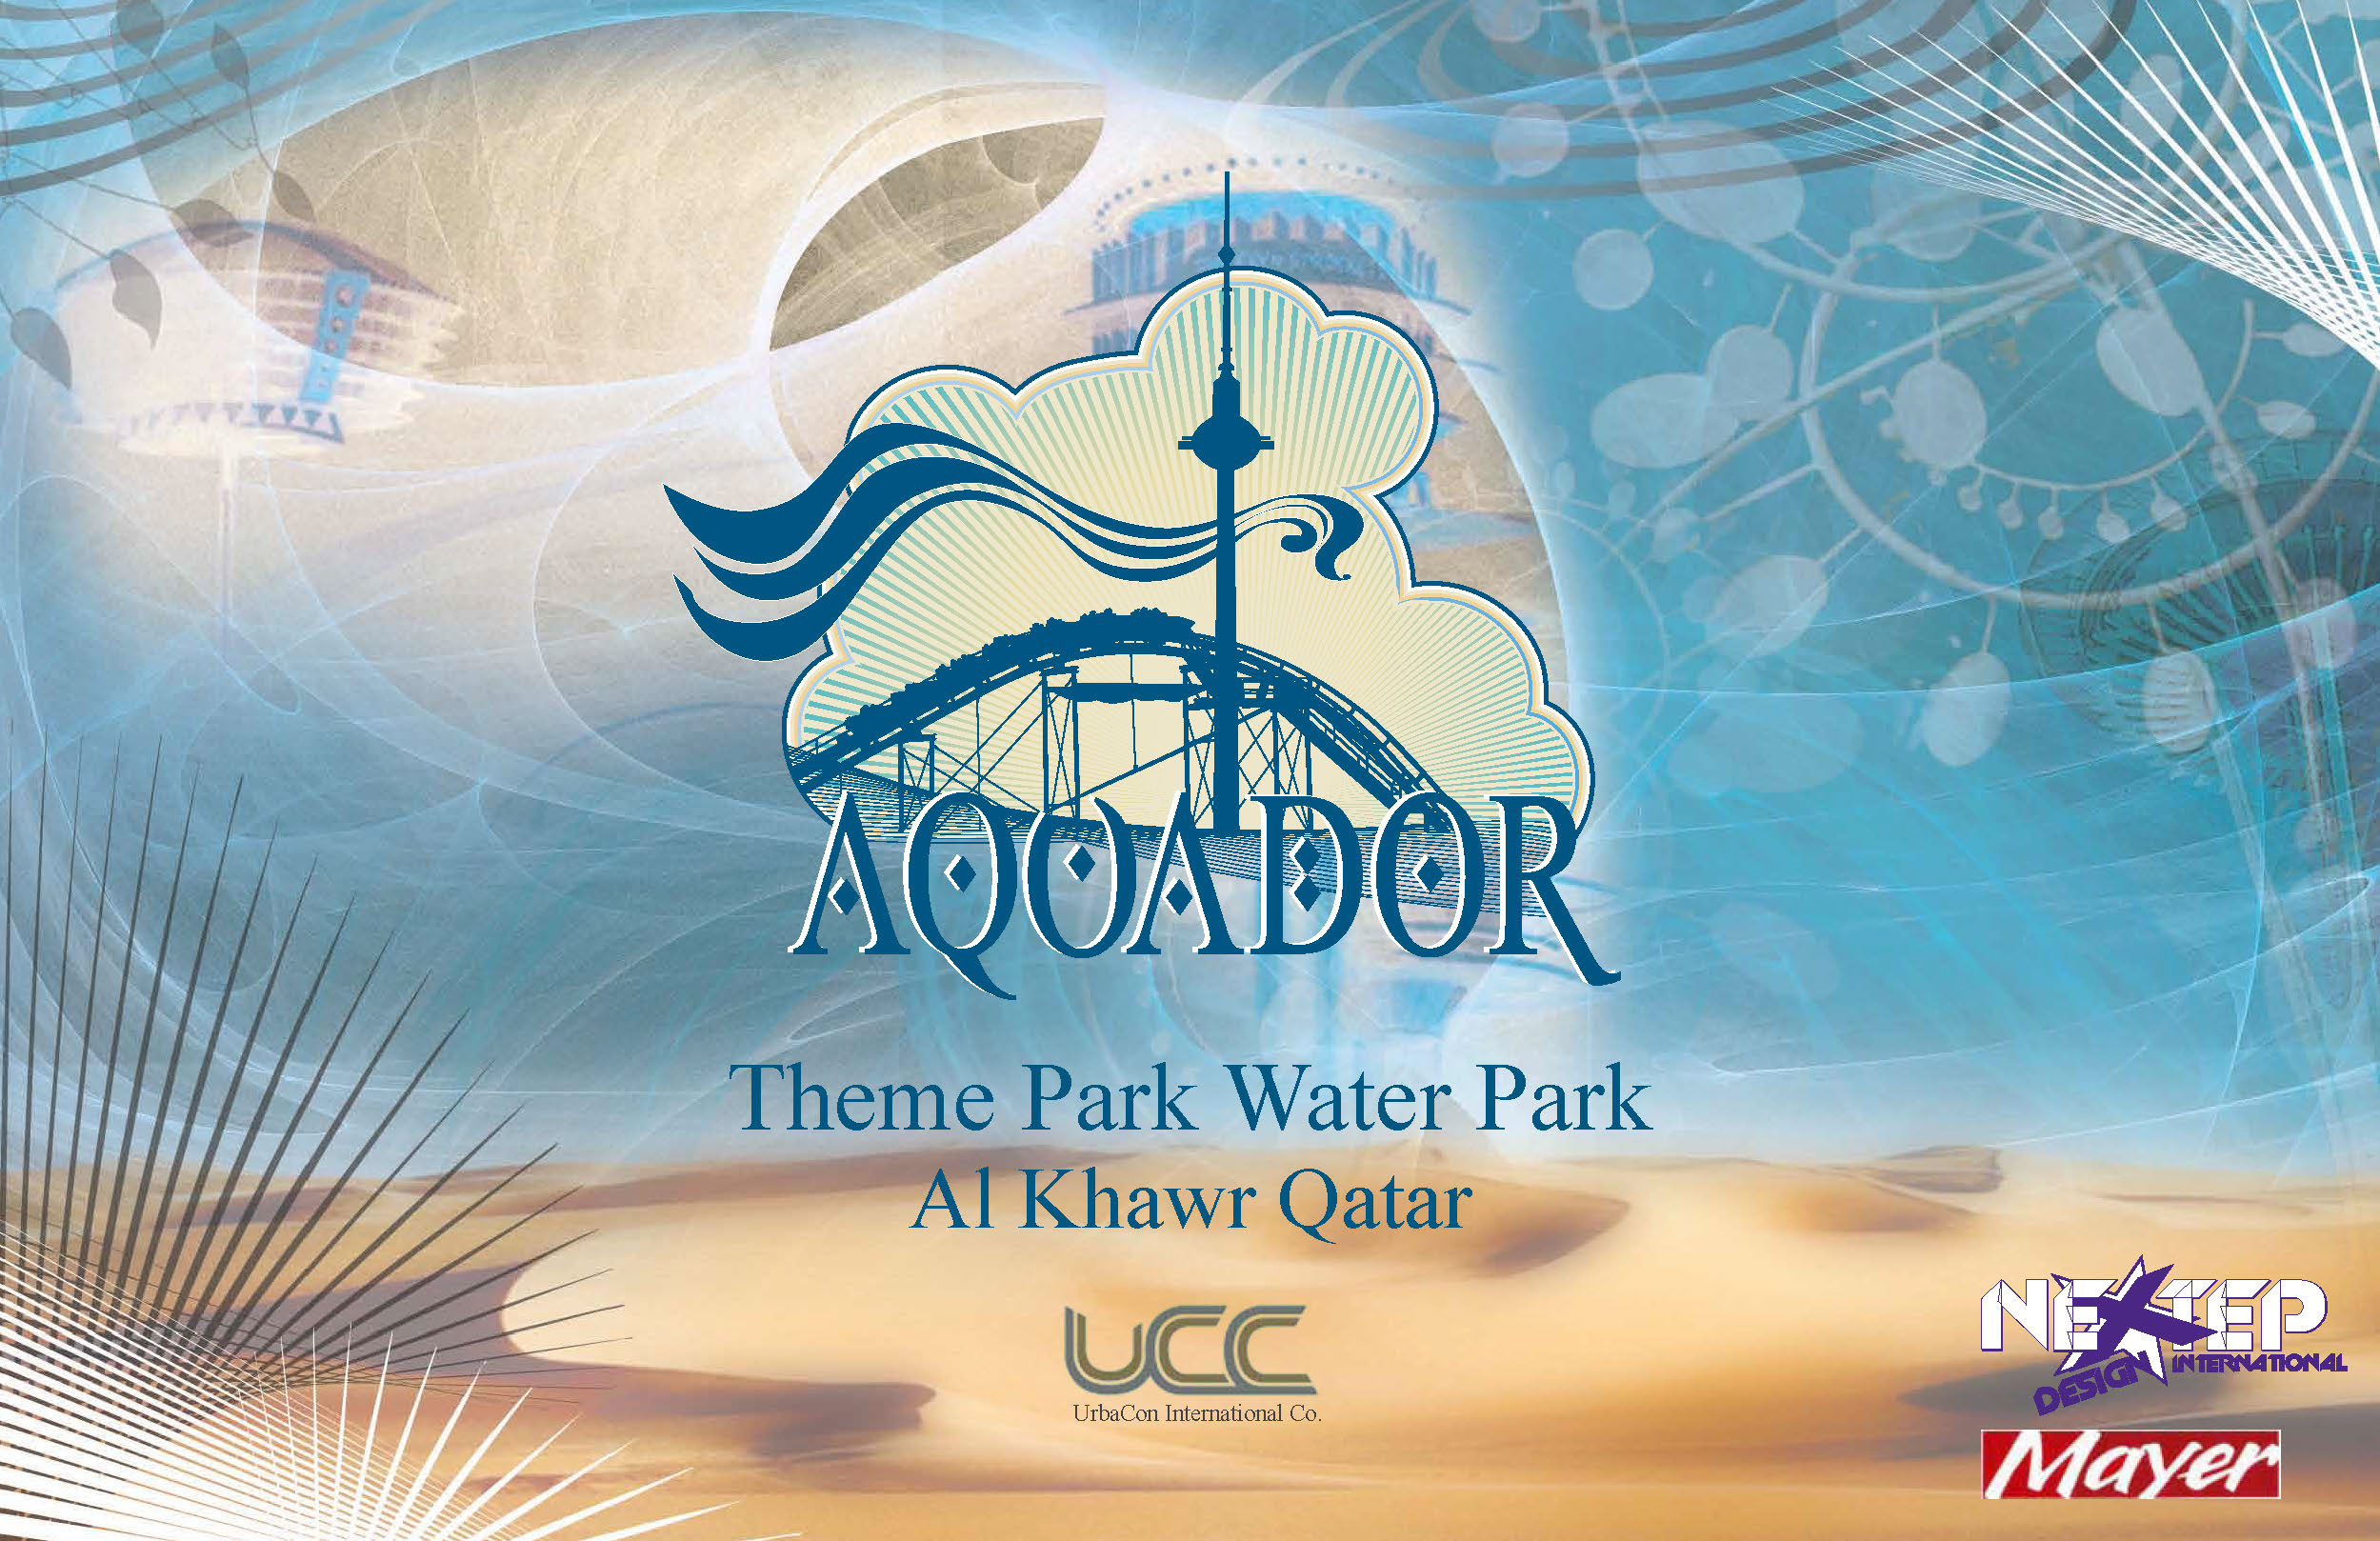 AlKwahr_Book-11-09-11 copy_Page_01.jpg